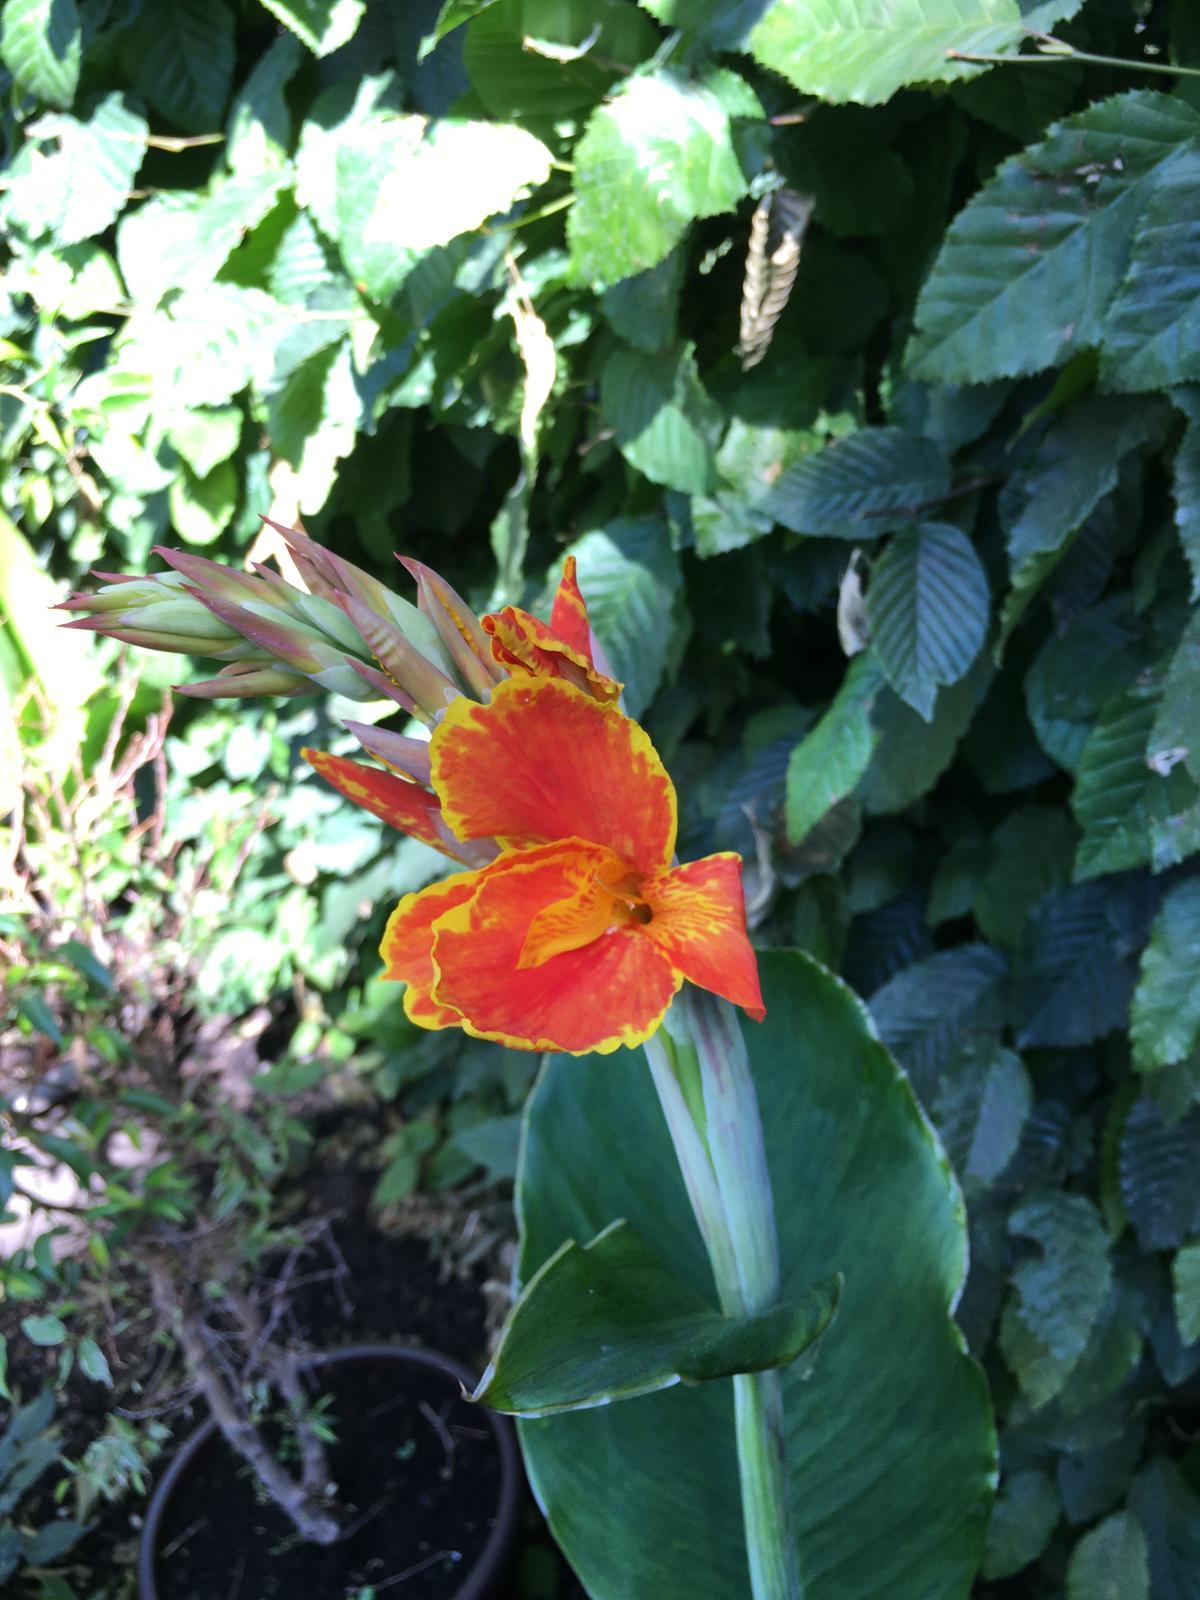 2020 😍 🌞 - Kana Tarouking jde konecne do kvetu - ta barva bude brutalni